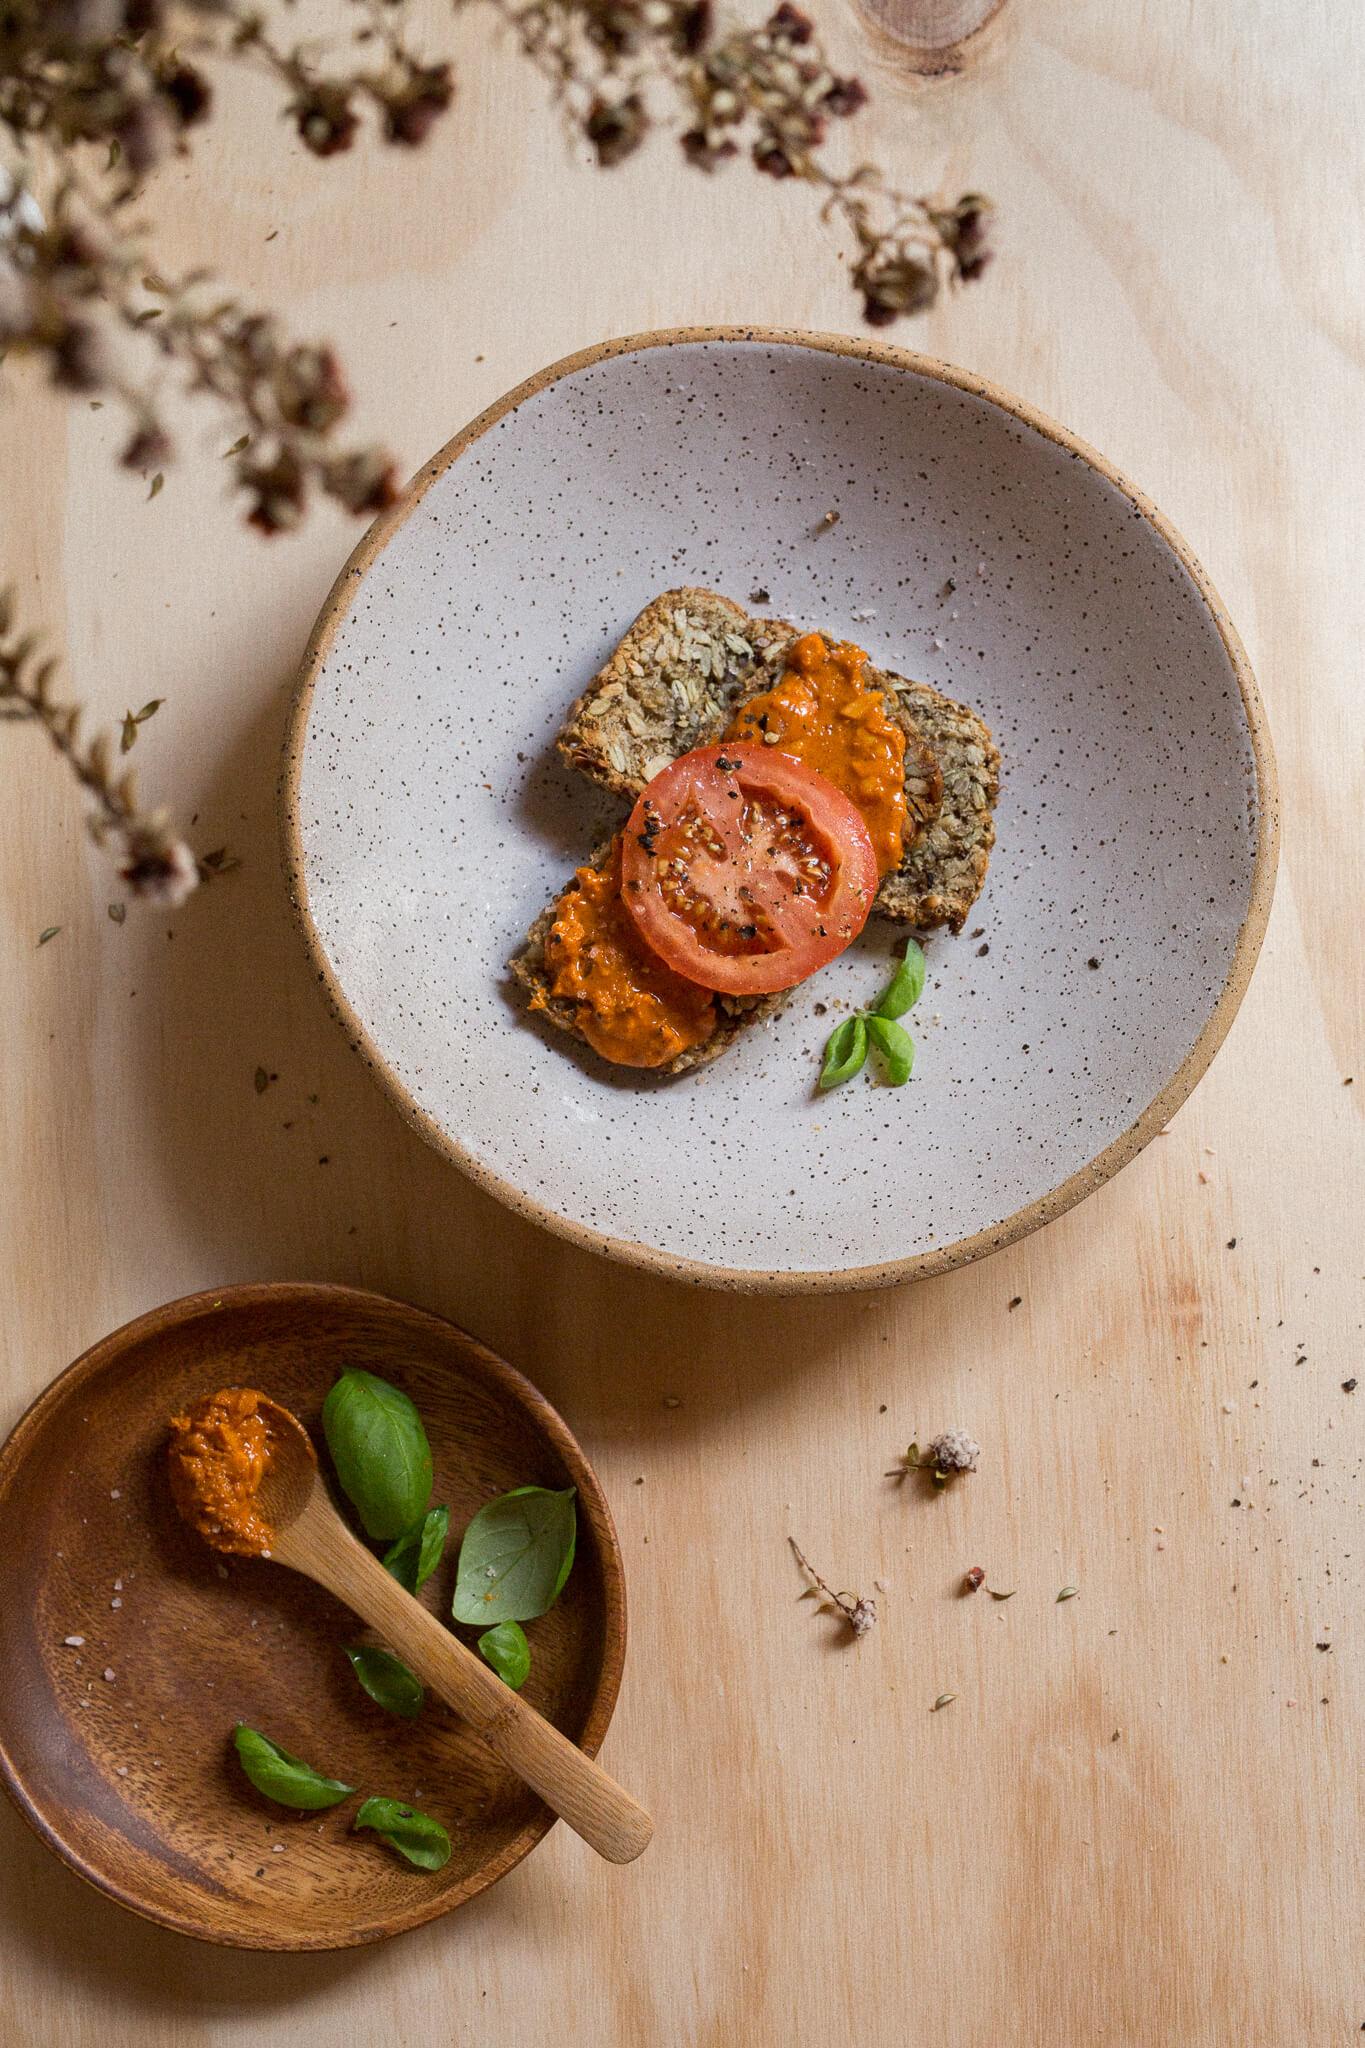 auckland-food-photographer-fixandfogg-peanut-butter.jpg